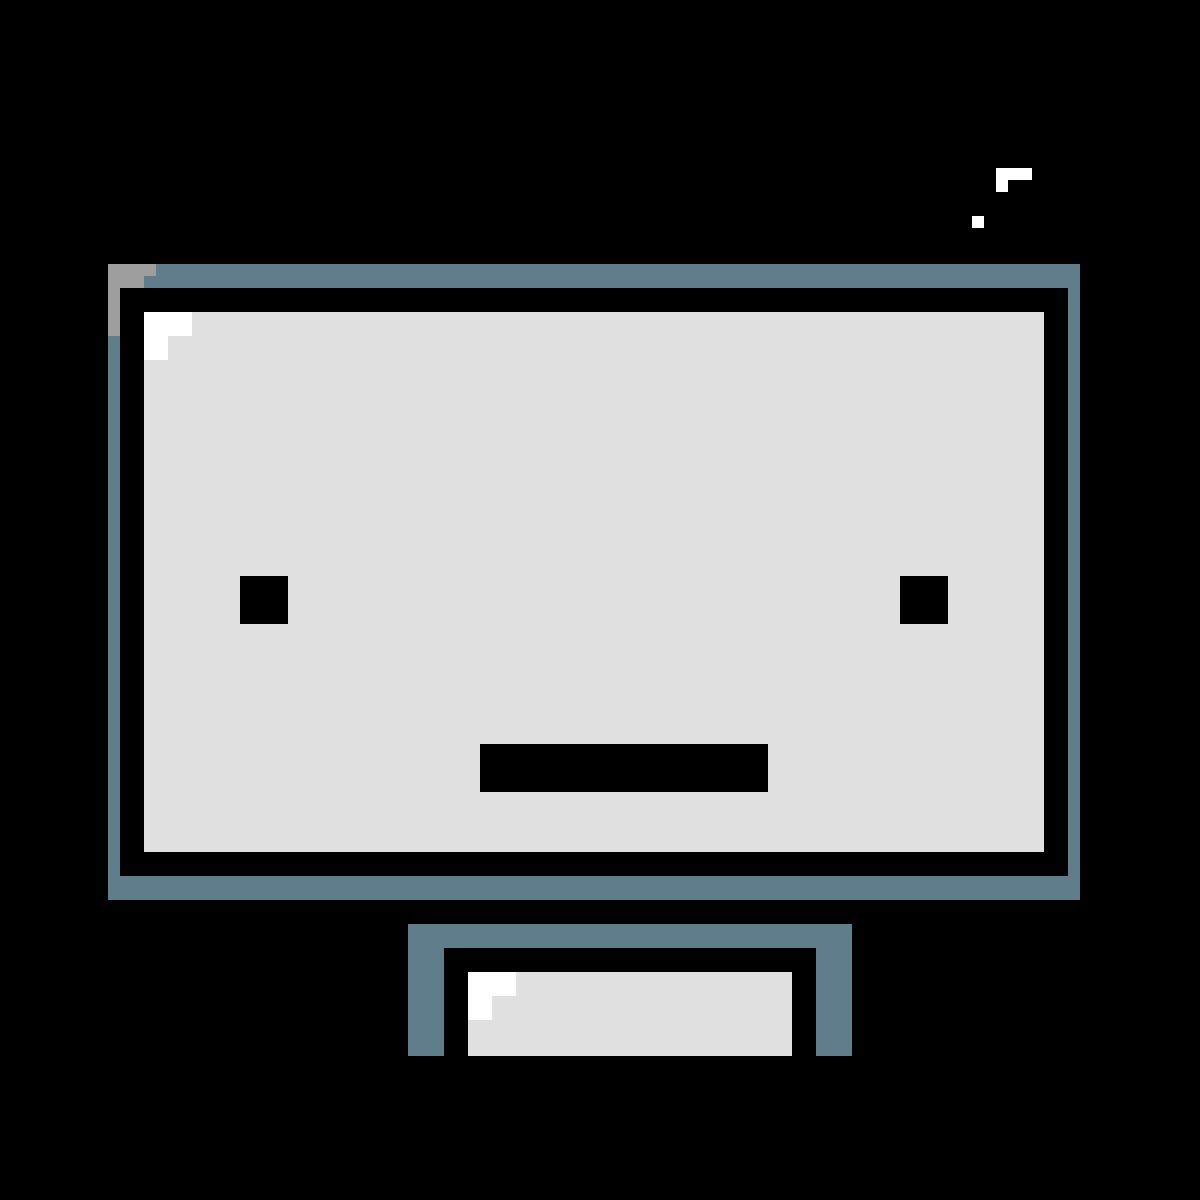 Pixilart - companion-bot by tinyrennie